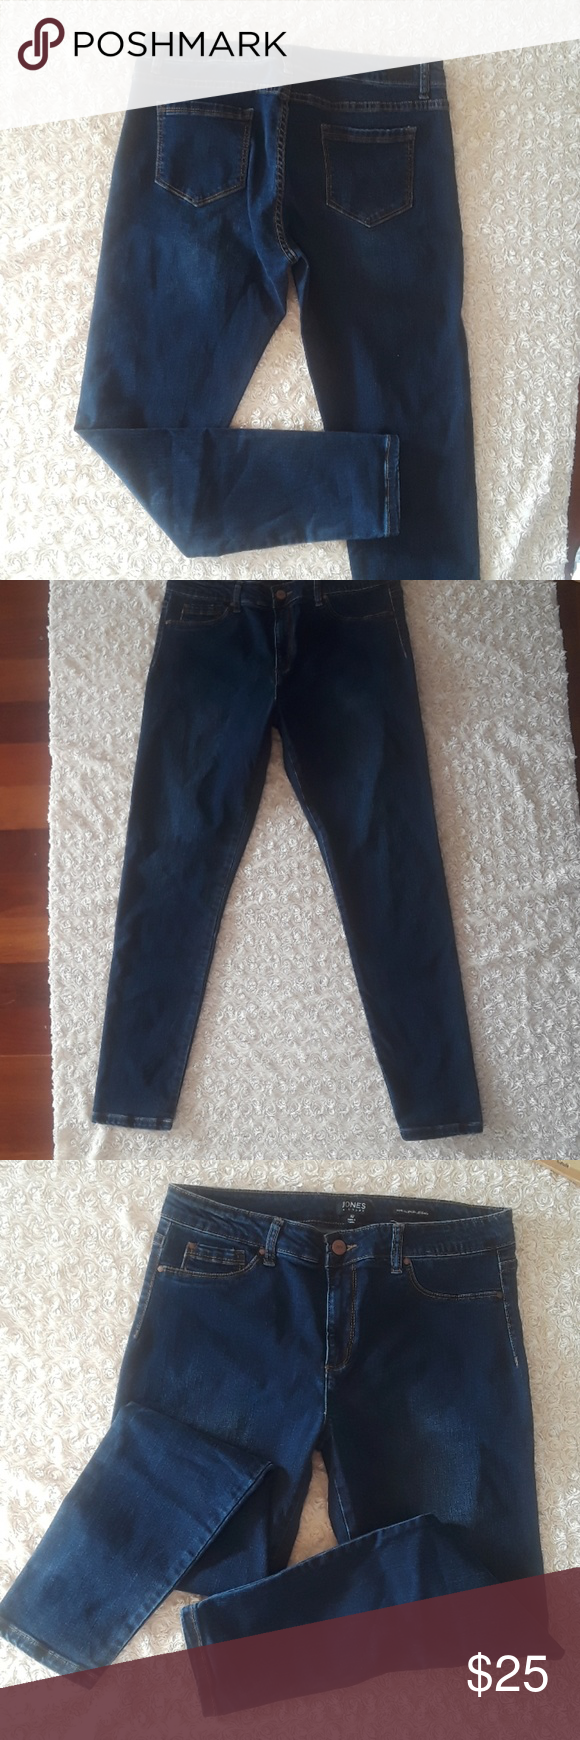 38d9b2e4 Jonss NY Tori Seamless Legging Jean's Size 12 Great condition. Skinny leg womens  jeans.